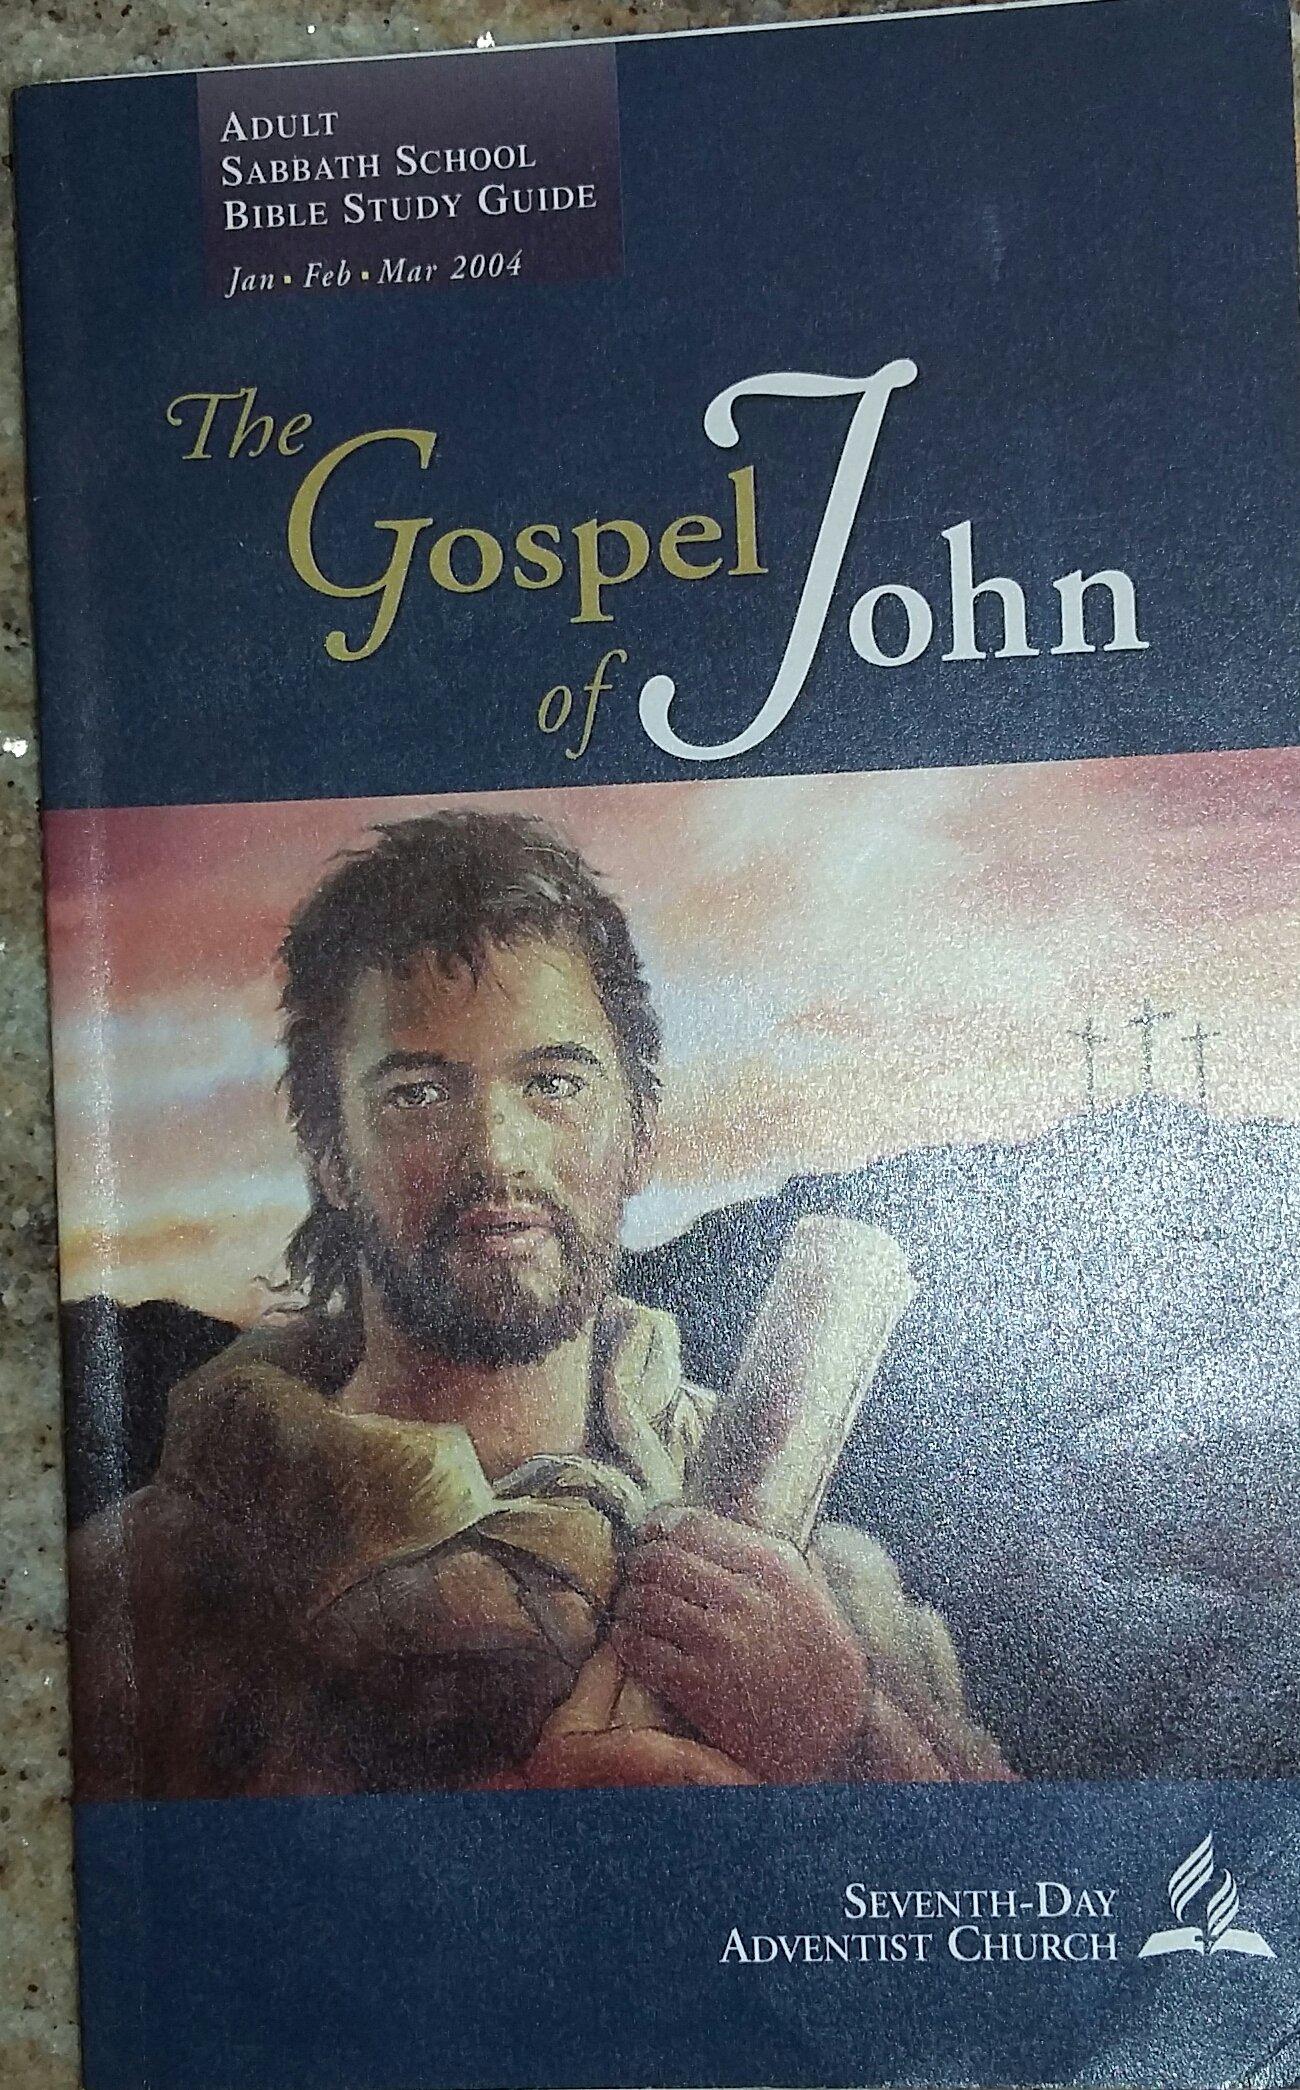 Download The Gospel of John - Adult Sabbath School Bible Study Guide (Jan, Feb, Mar 2004) (Seventh-Day Adventist Church) PDF